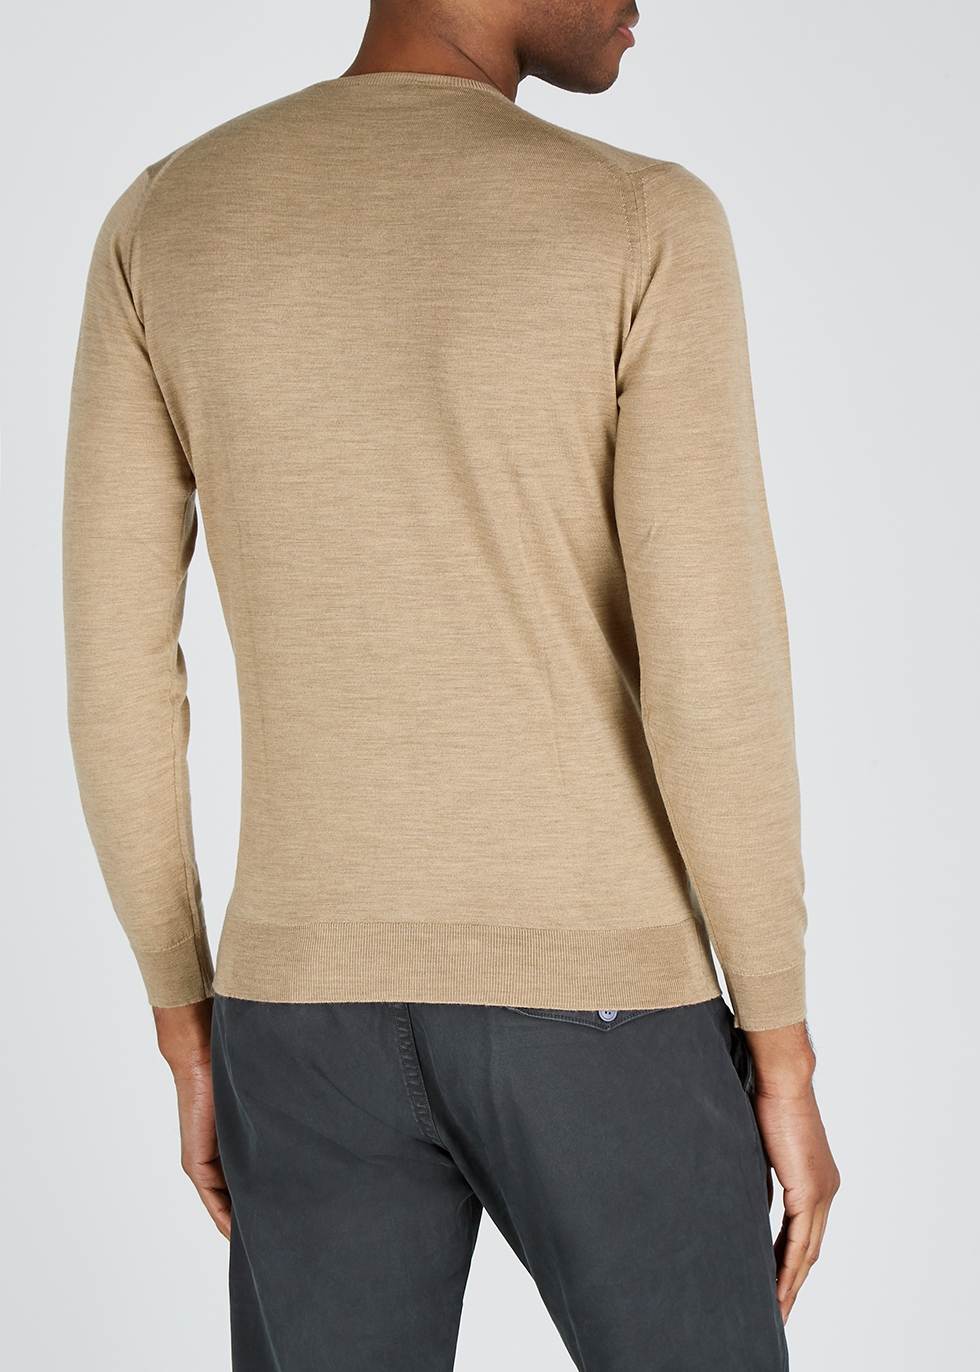 Sherman camel cashmere and wool-blend jumper - John Smedley